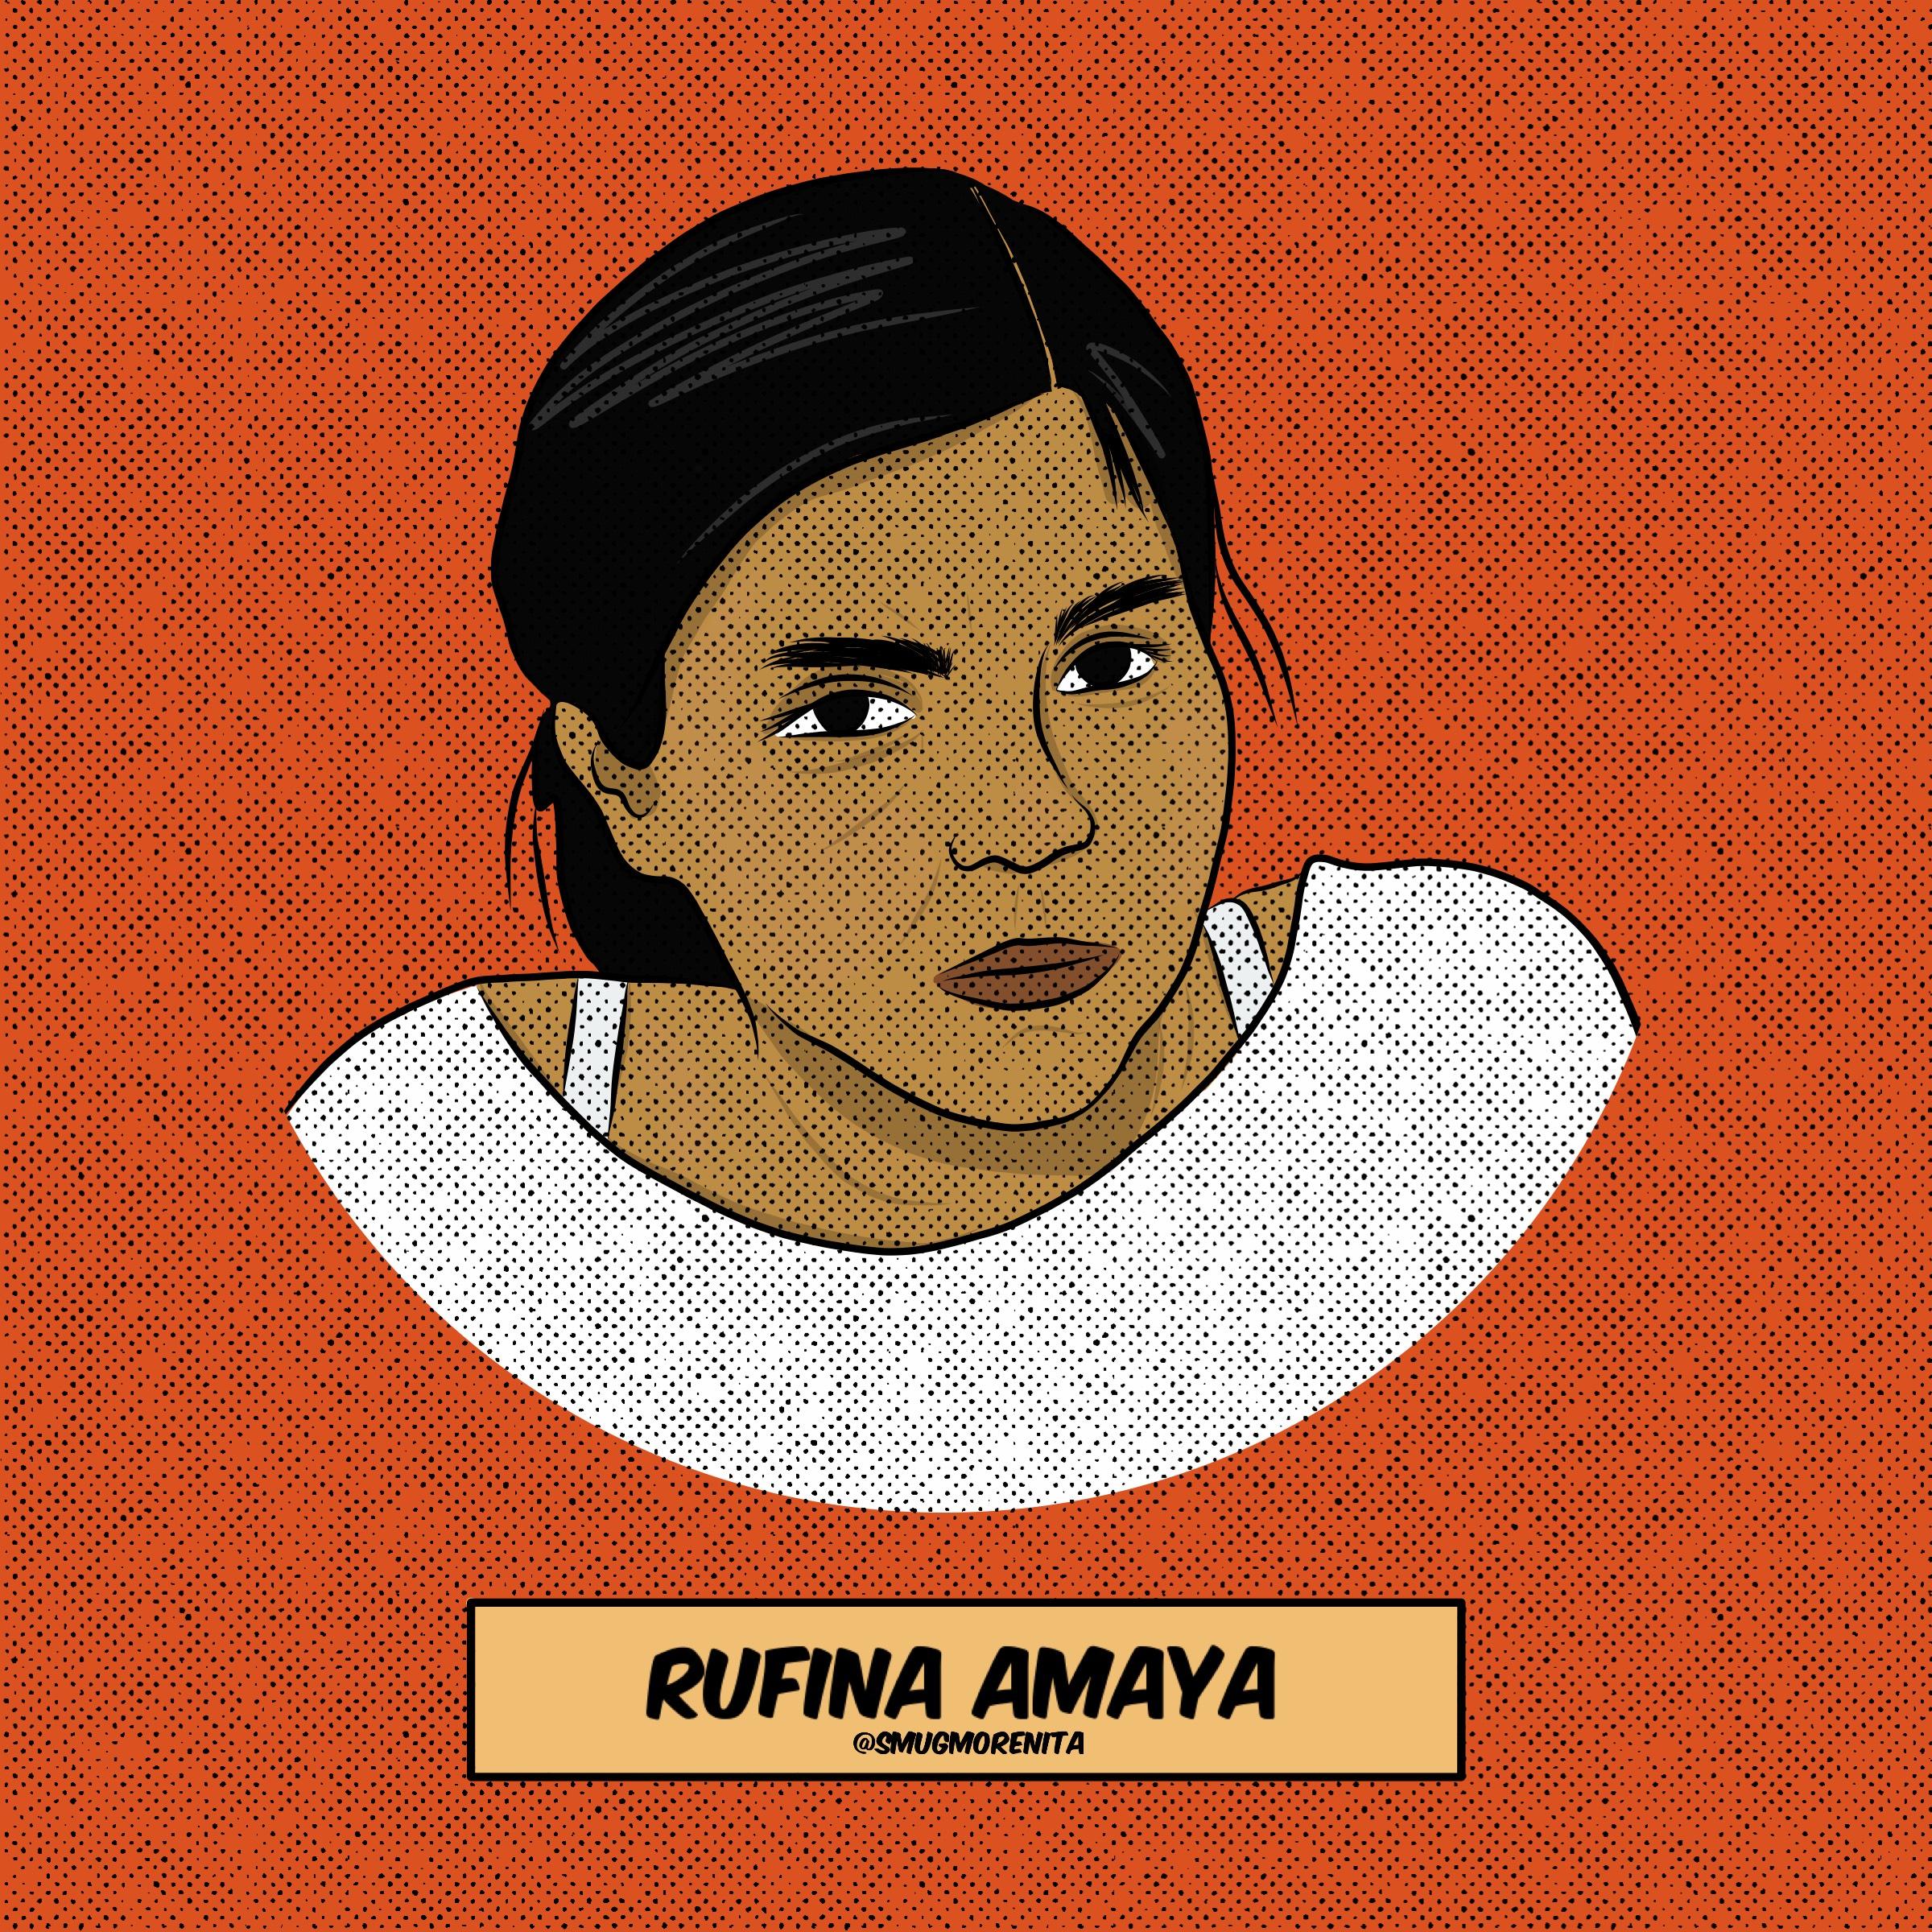 Rufina Amaya - Web Image .jpg